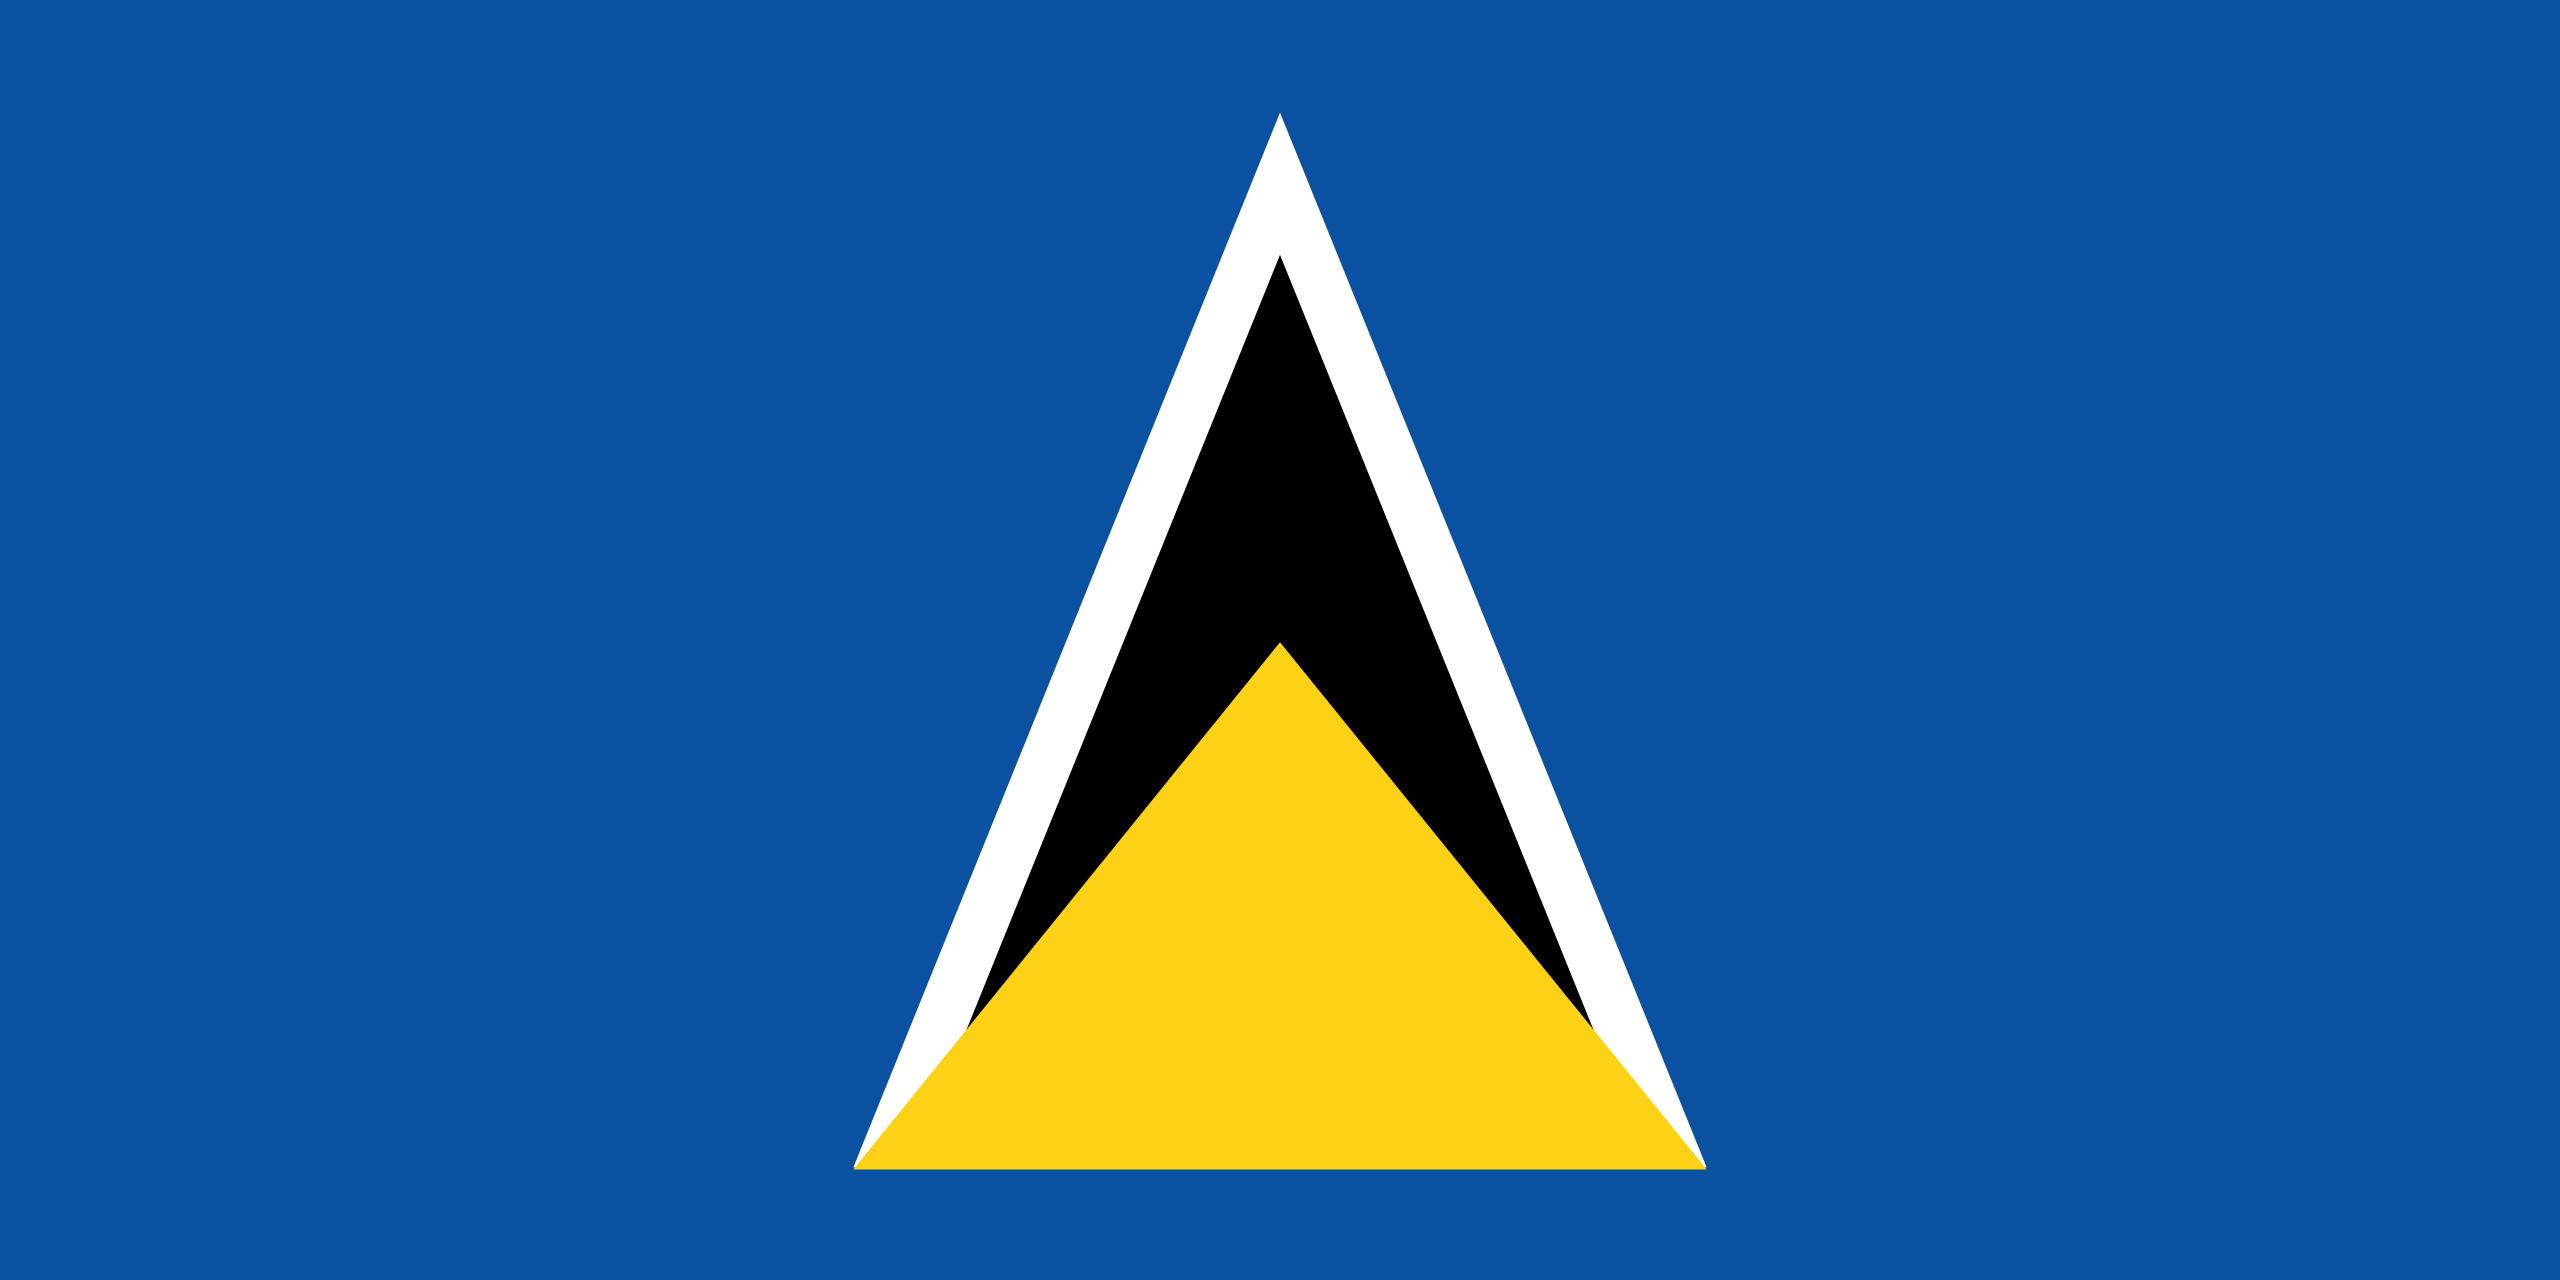 सांता लूसिया, देश, emblema, लोग�प्रतीकbolo - HD वॉलपेपर - प्रोफेसर-falken.com